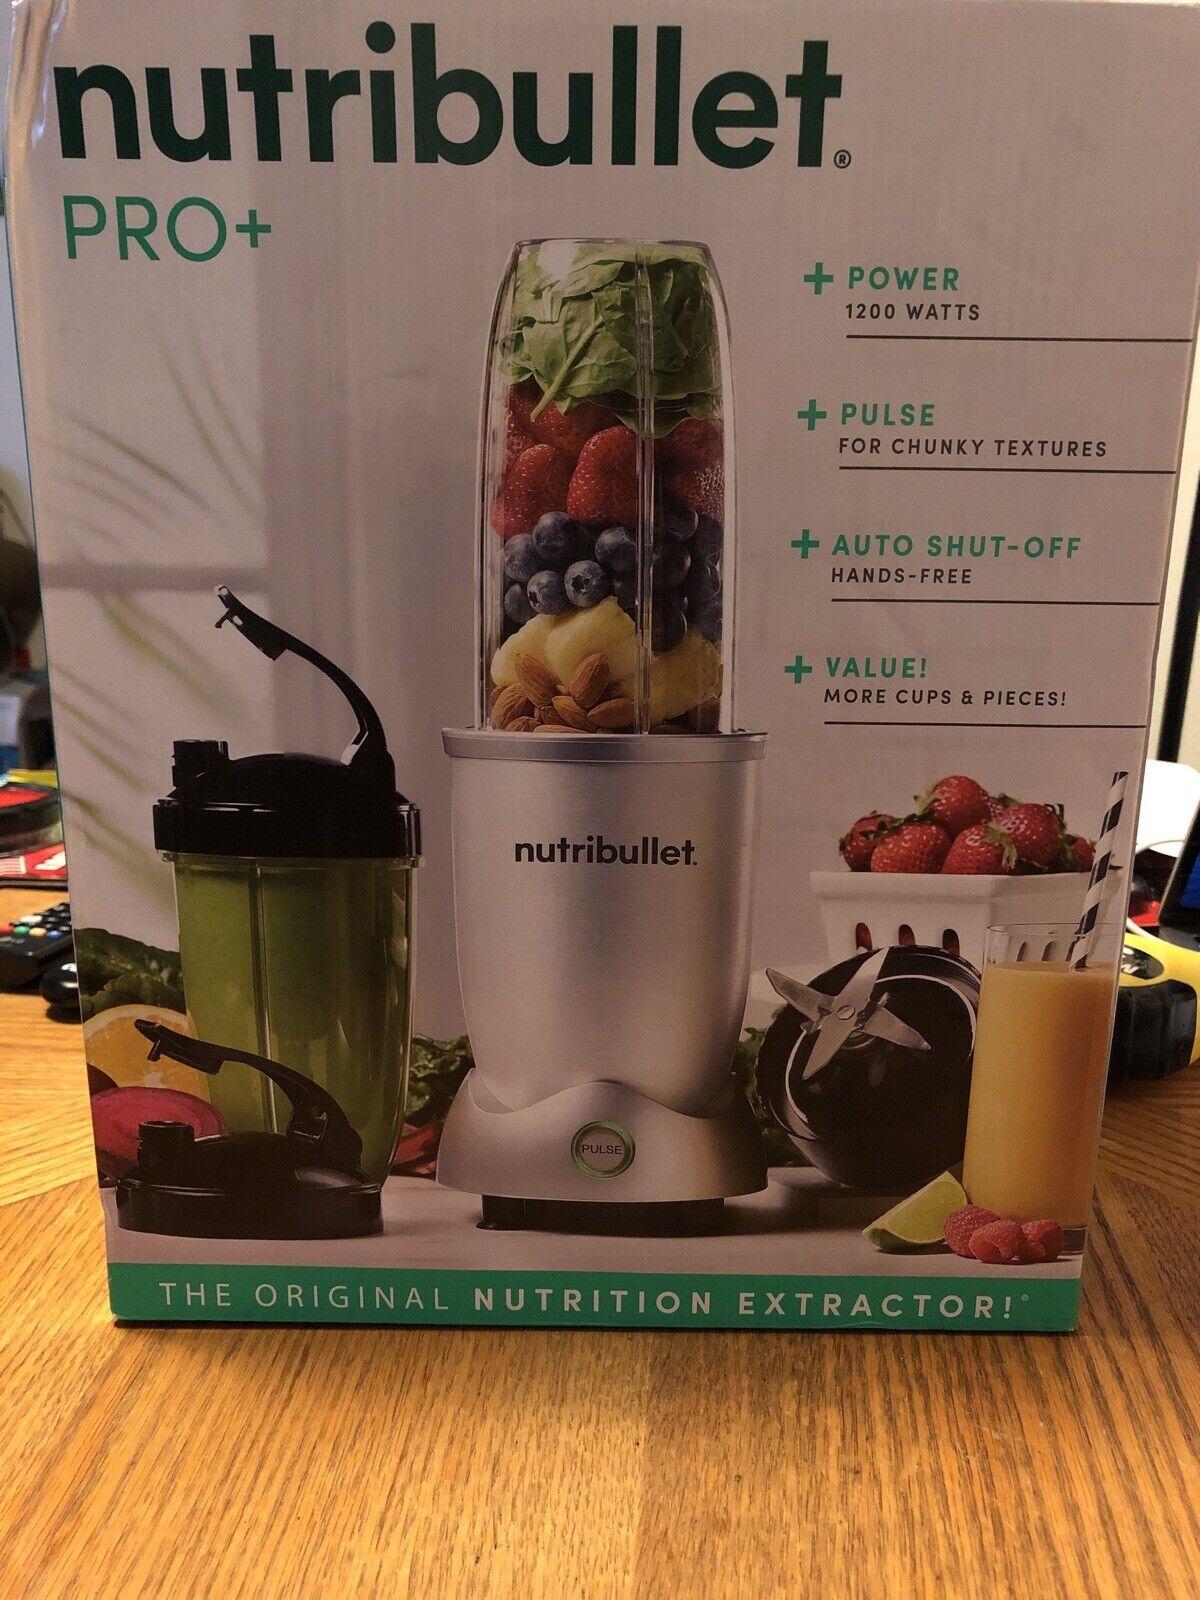 Nutribullet N12 1001 Pro Plus 1200w Nutrition Extractor Blender For Sale Online Ebay